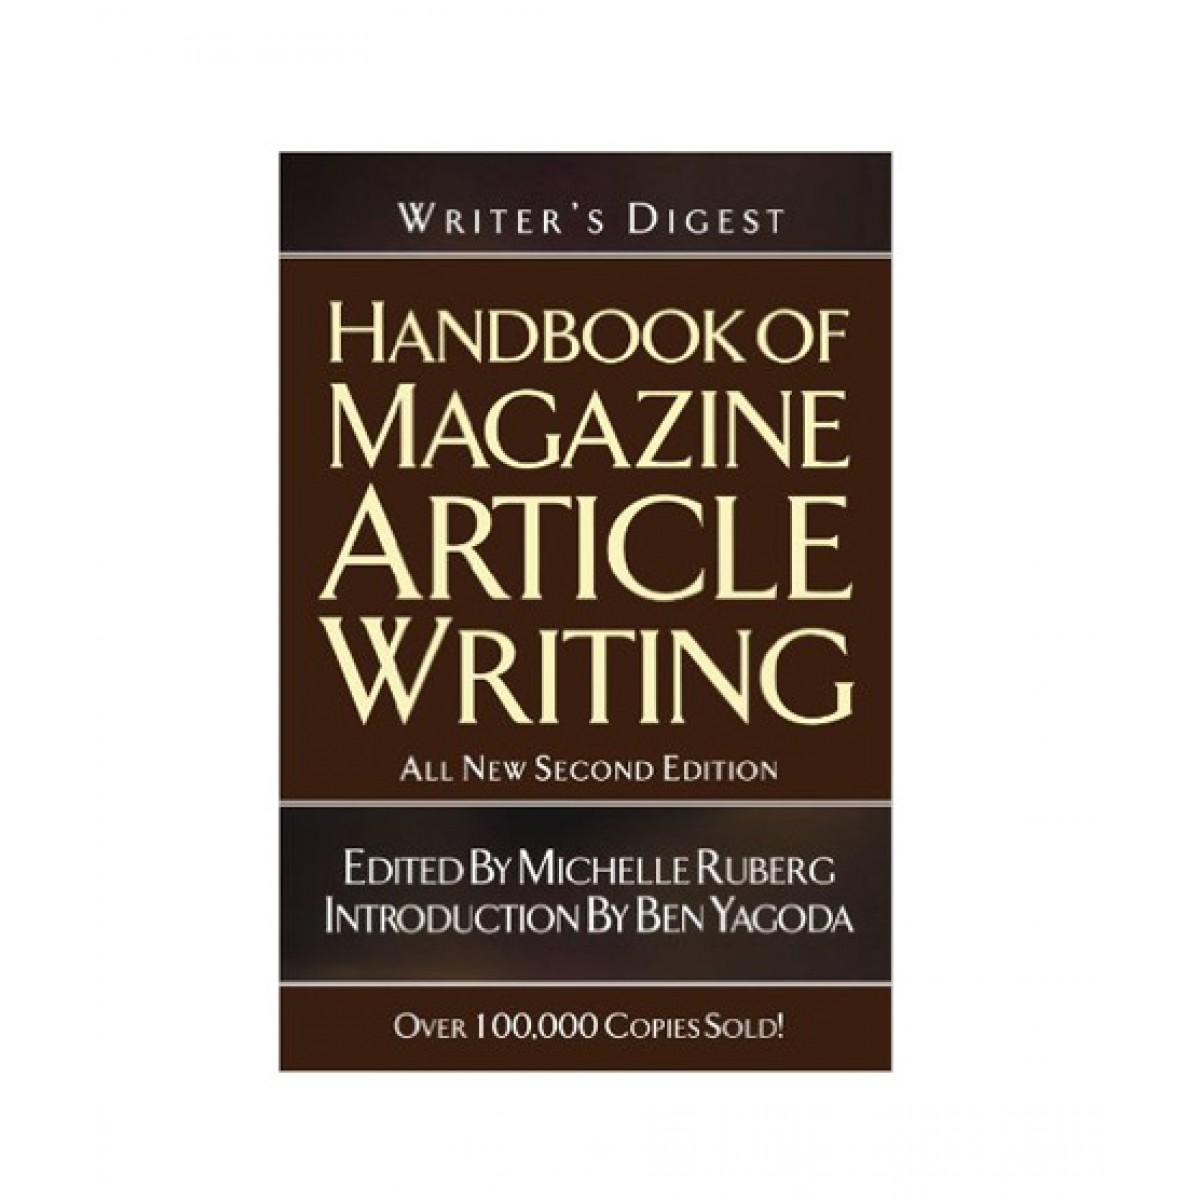 Writer's Digest Handbook of Magazine Article Writing Book 2nd Edition